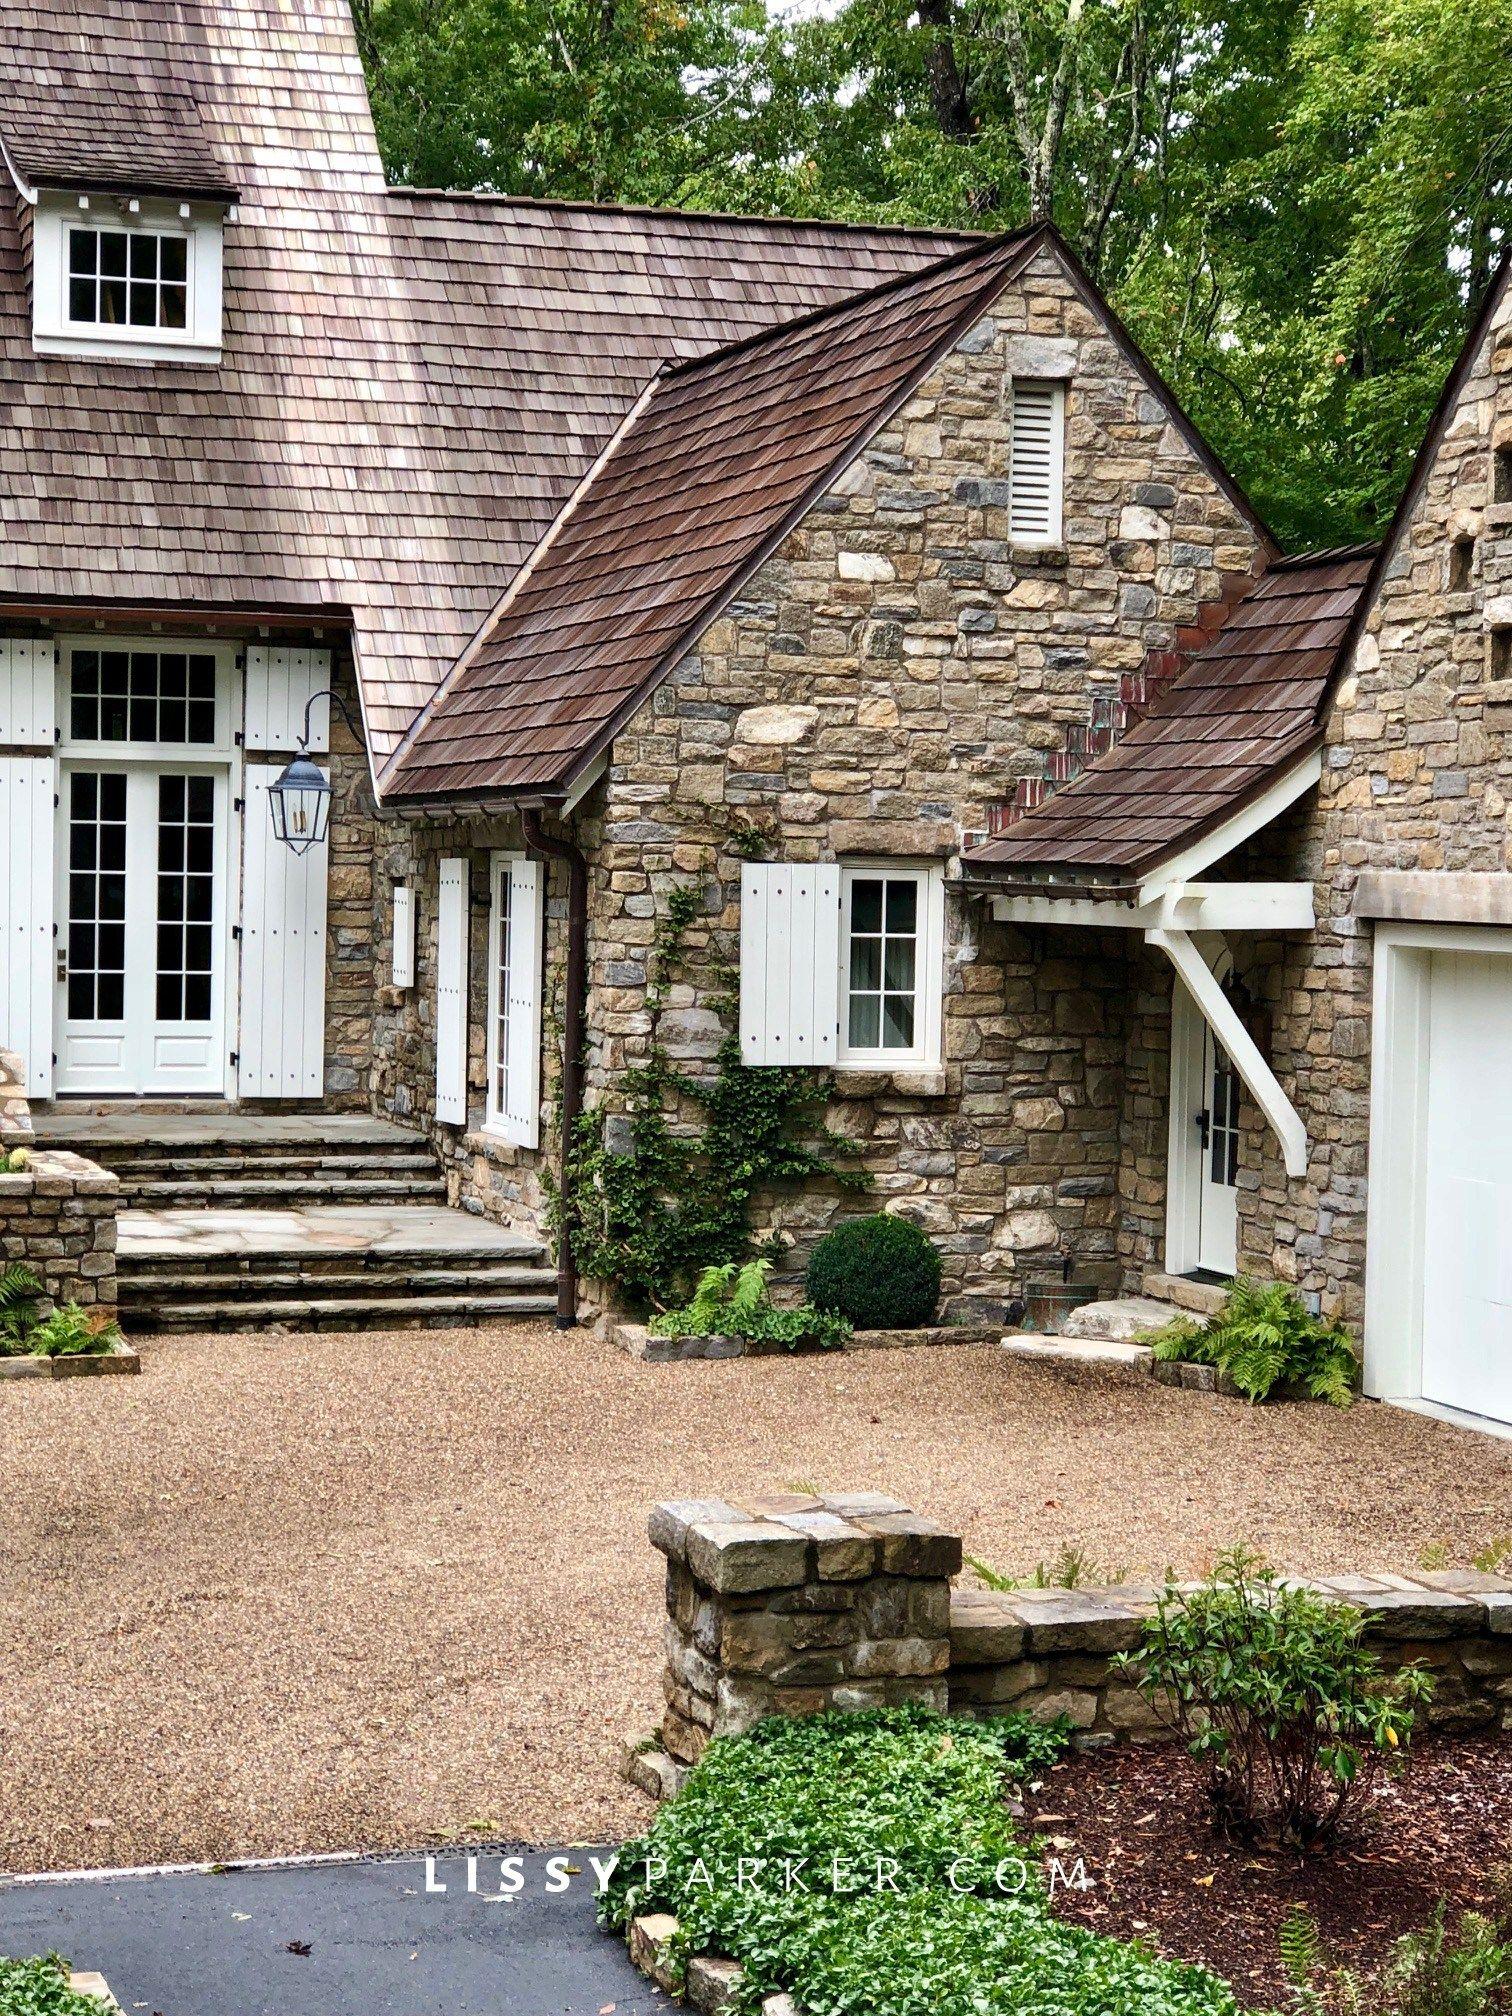 House Crush N 43 Stone House Lissyparker Com House Exterior Rustic Houses Exterior Modern Farmhouse Exterior